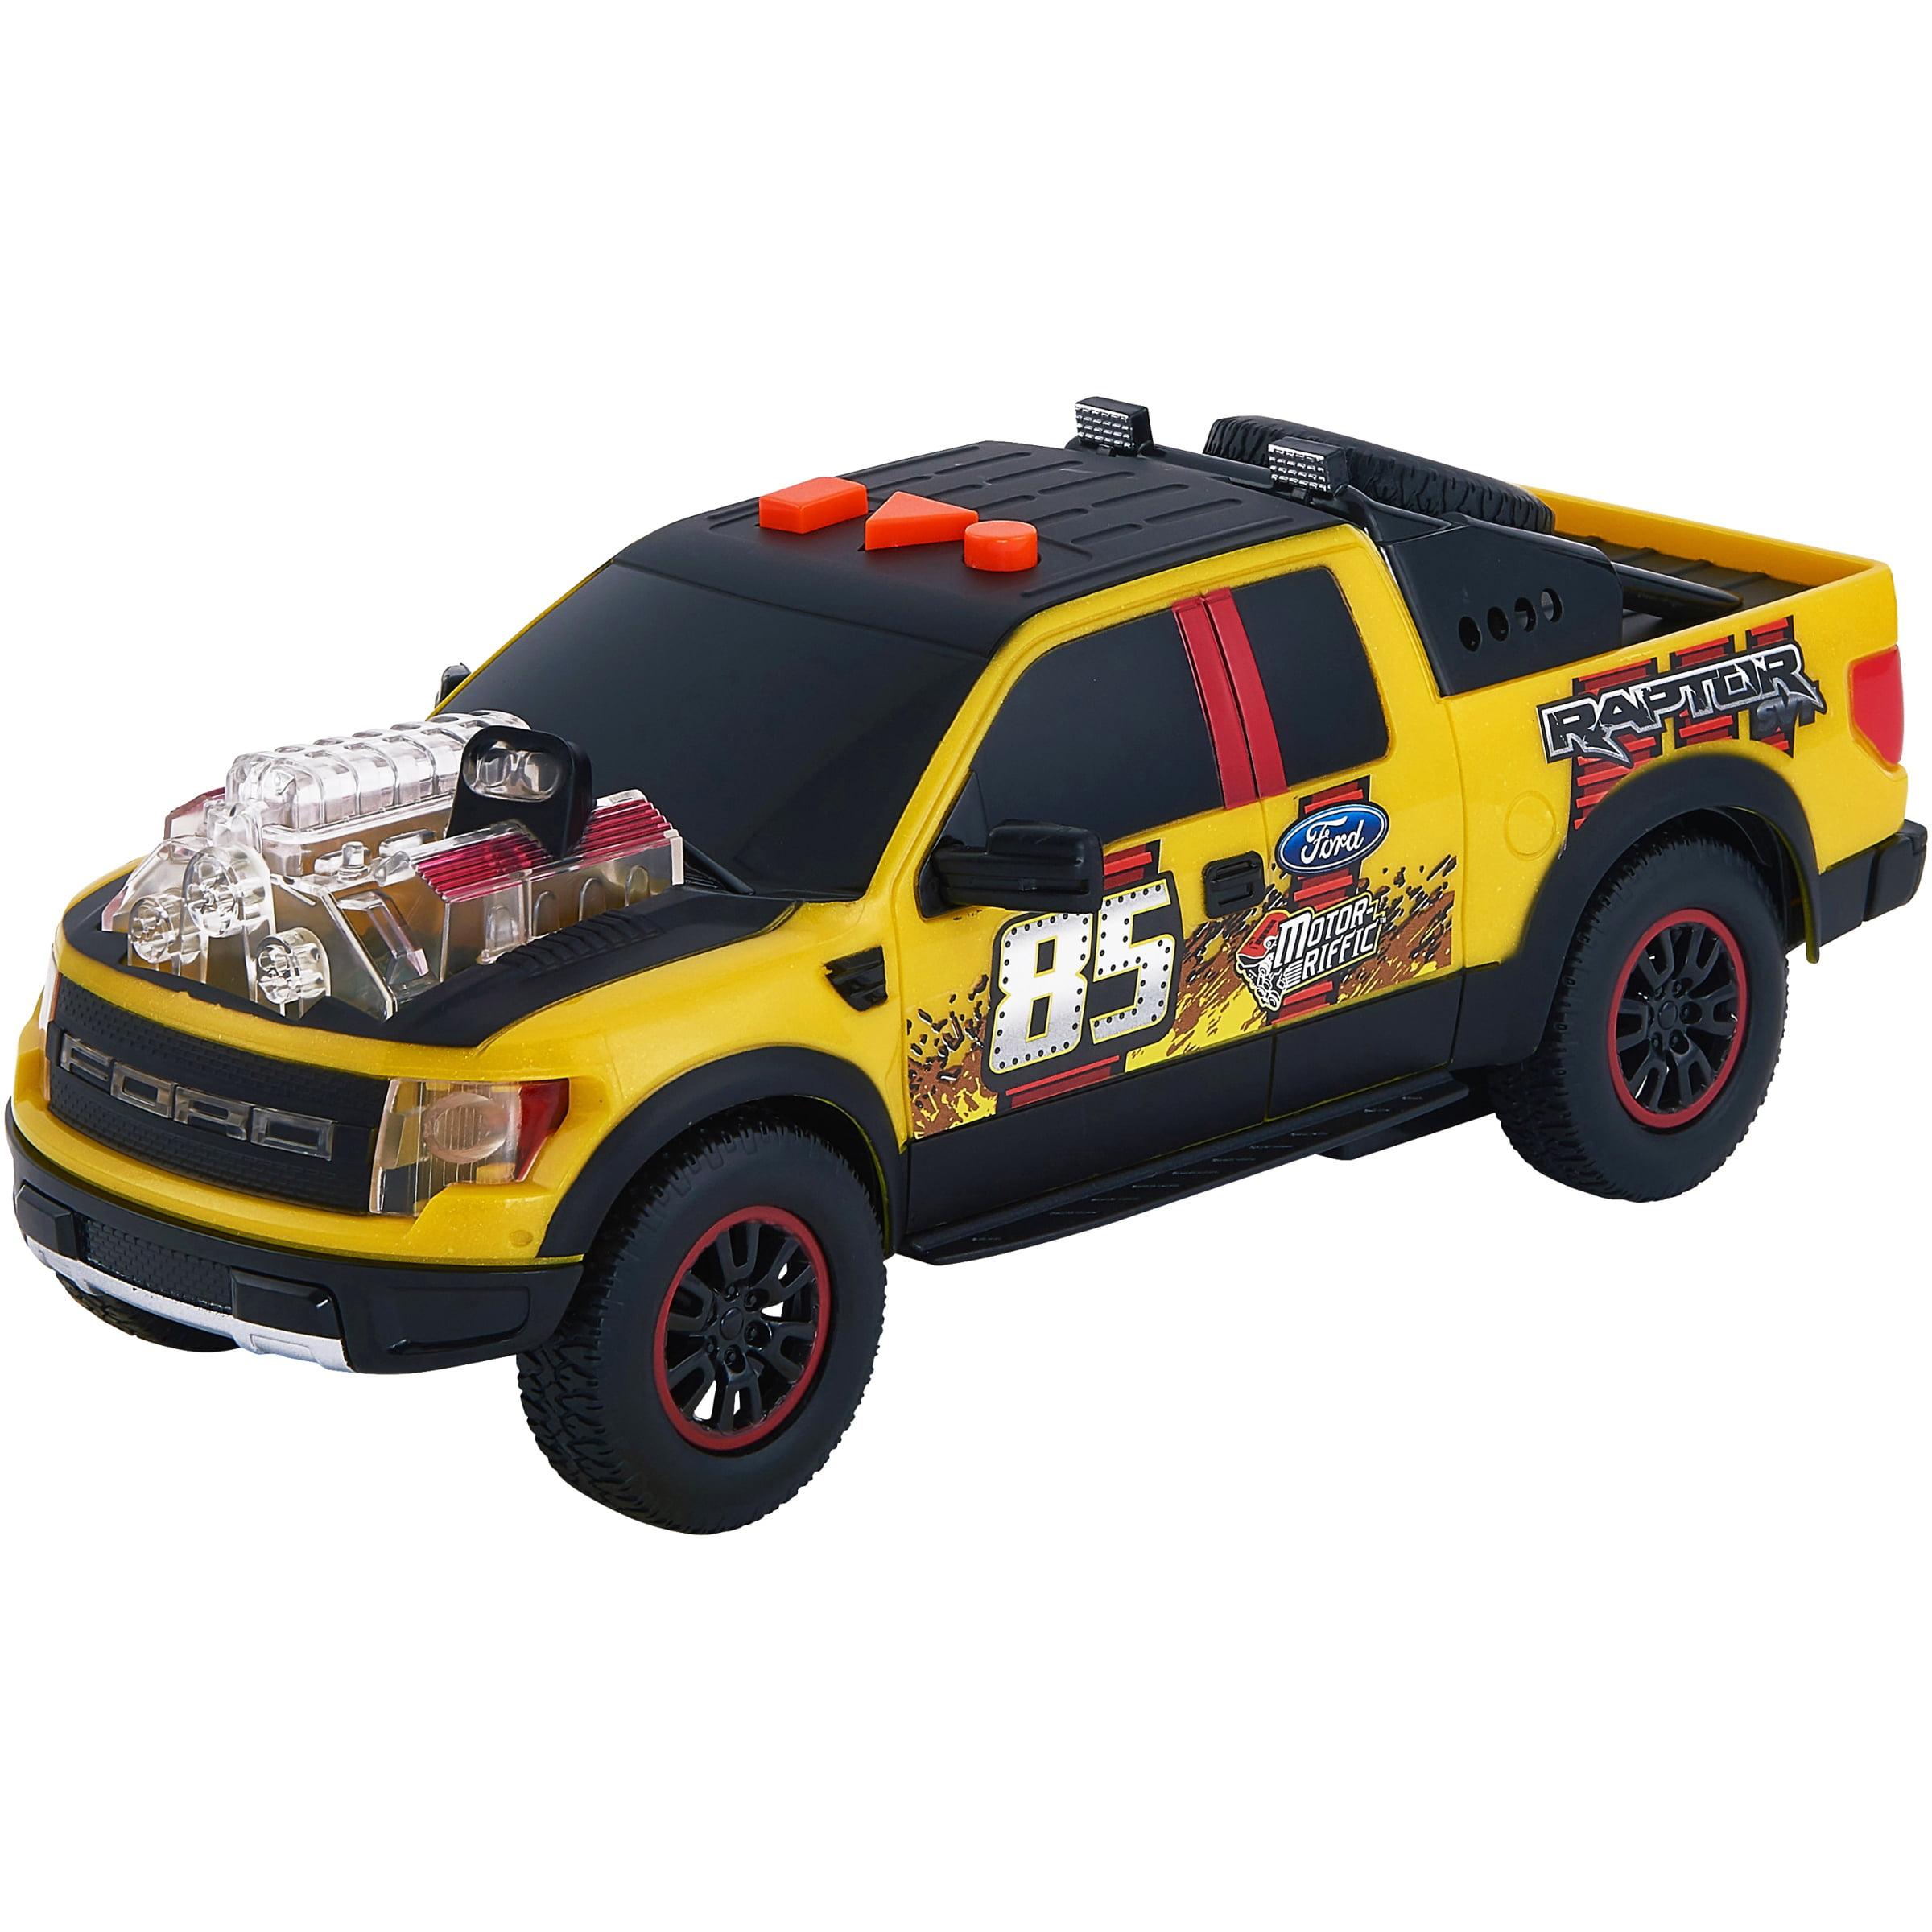 Adventure Force Lights & Sound Motor-Riffic Motorized Vehicle, Yellow